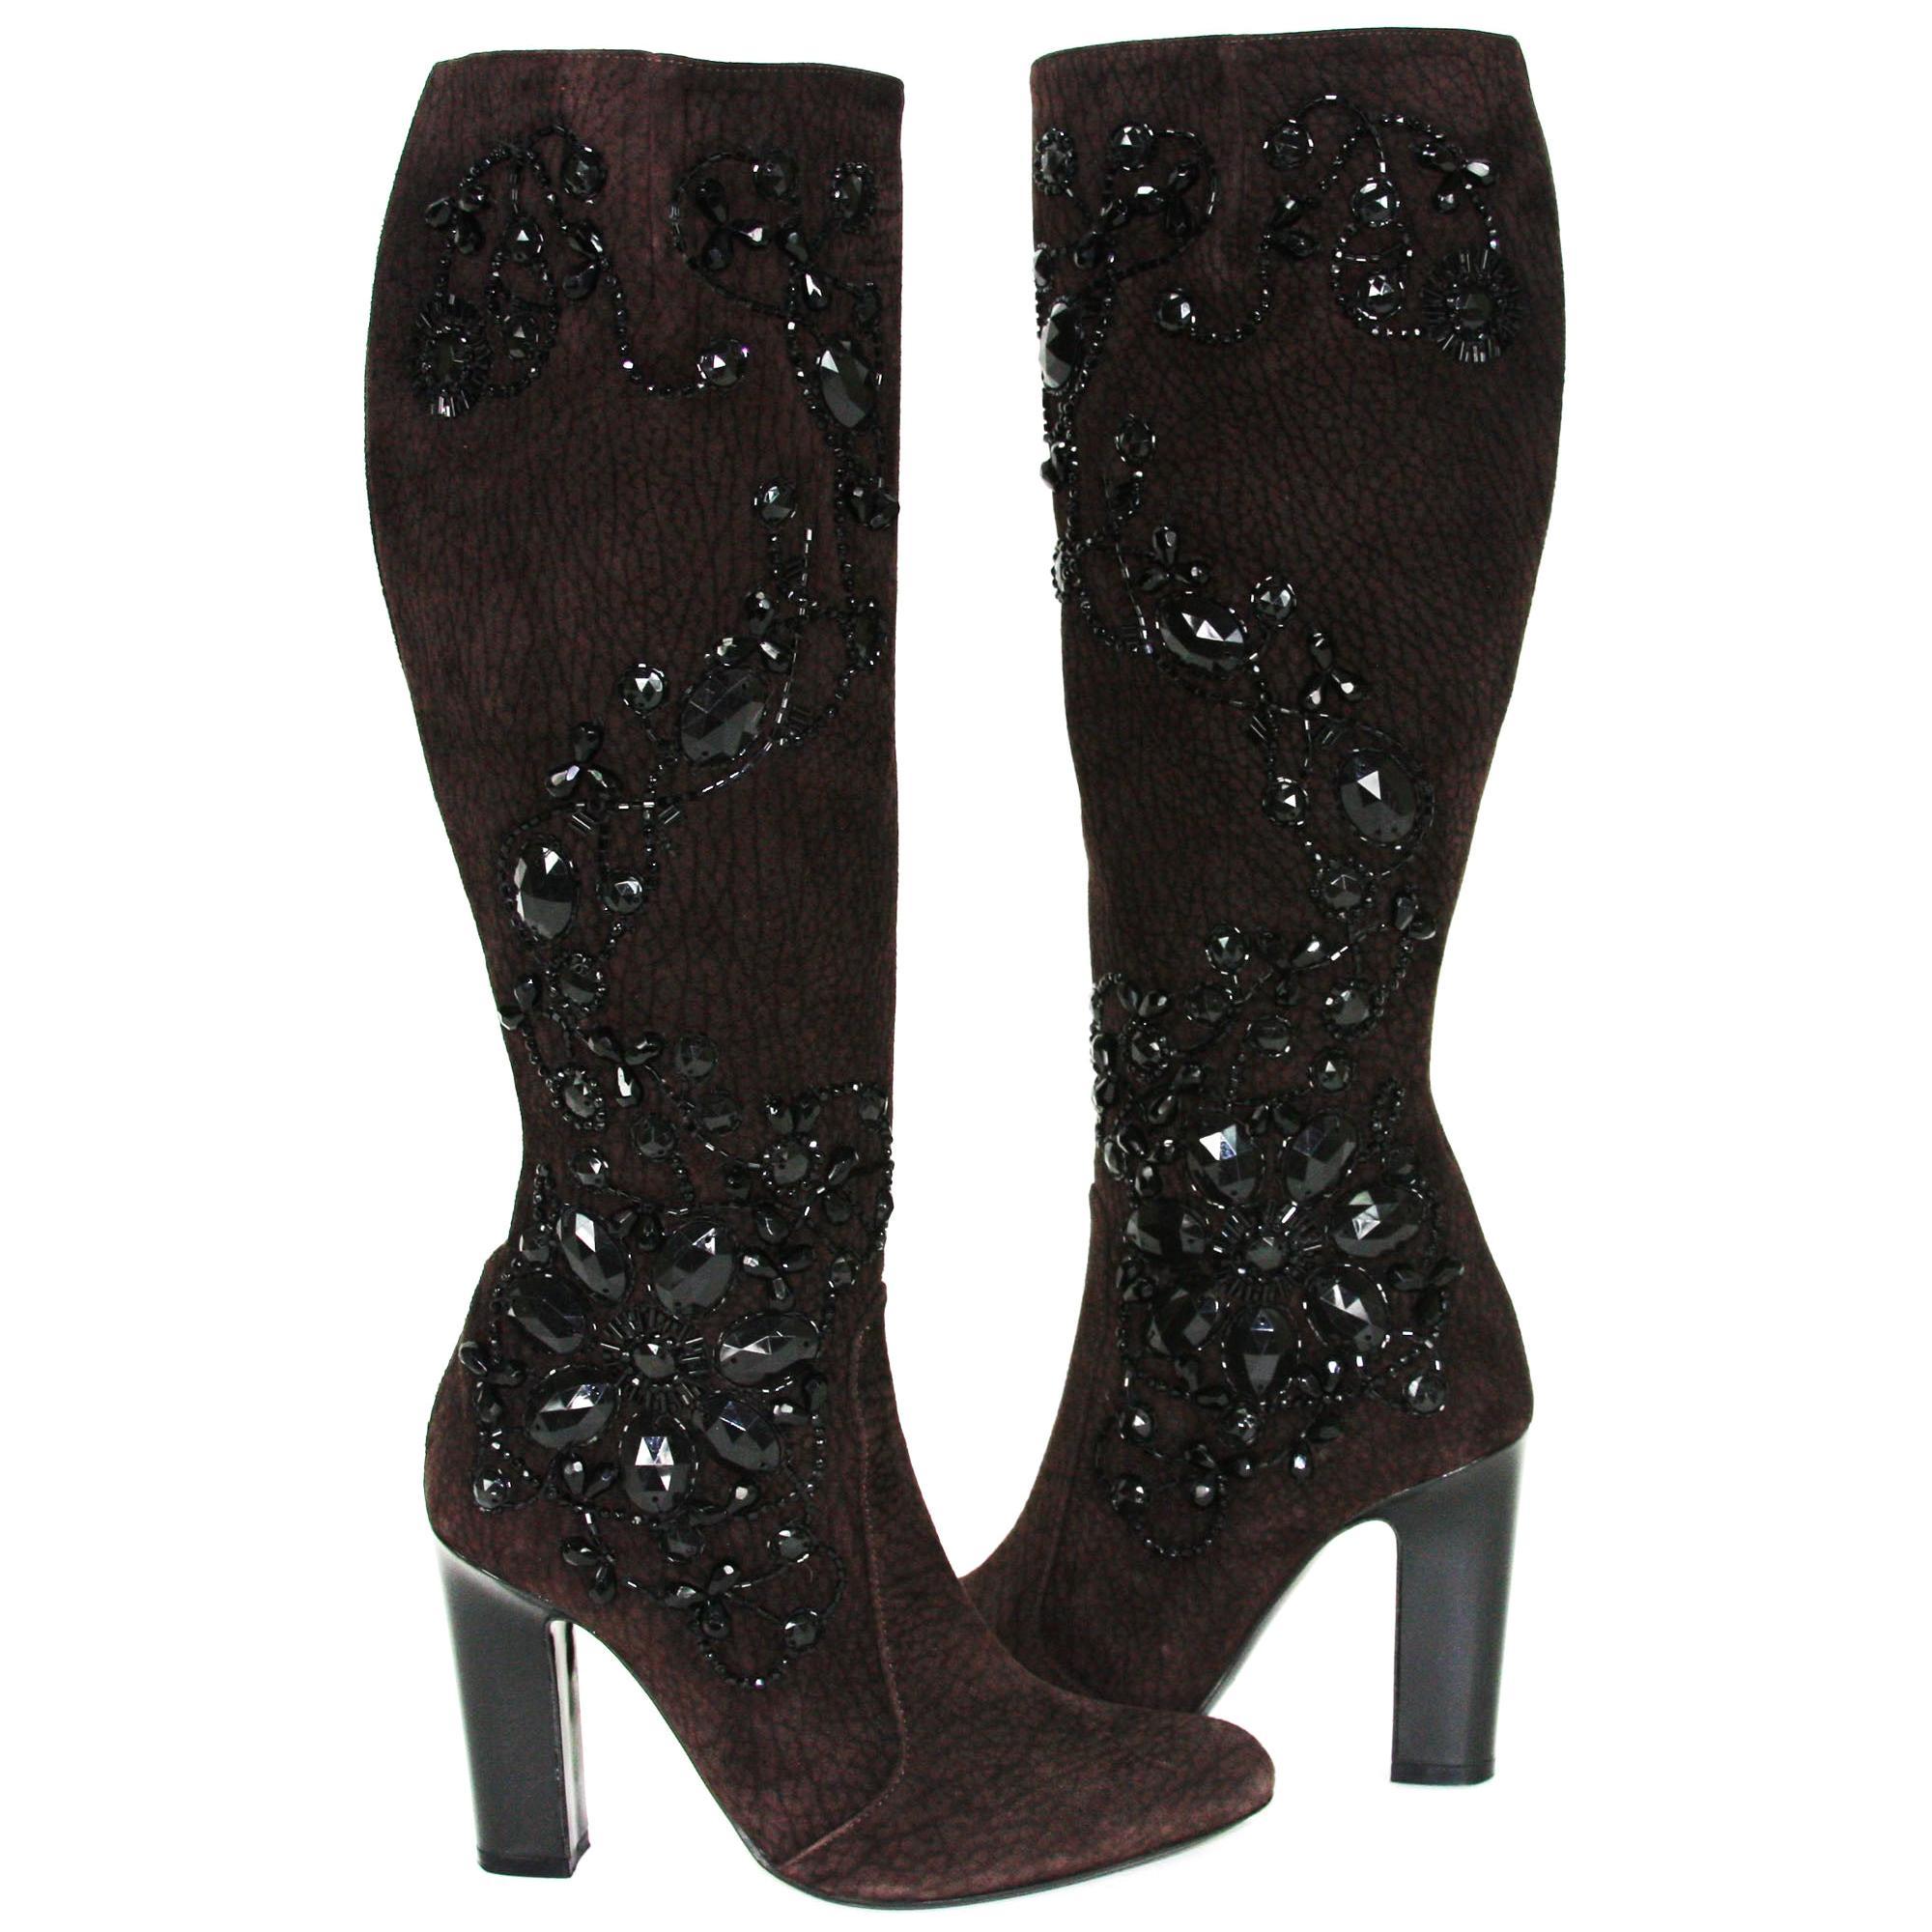 New Rene Caovilla Beaded Chocolate Suede Knee Heel Boots It 36.5 - US 6.5